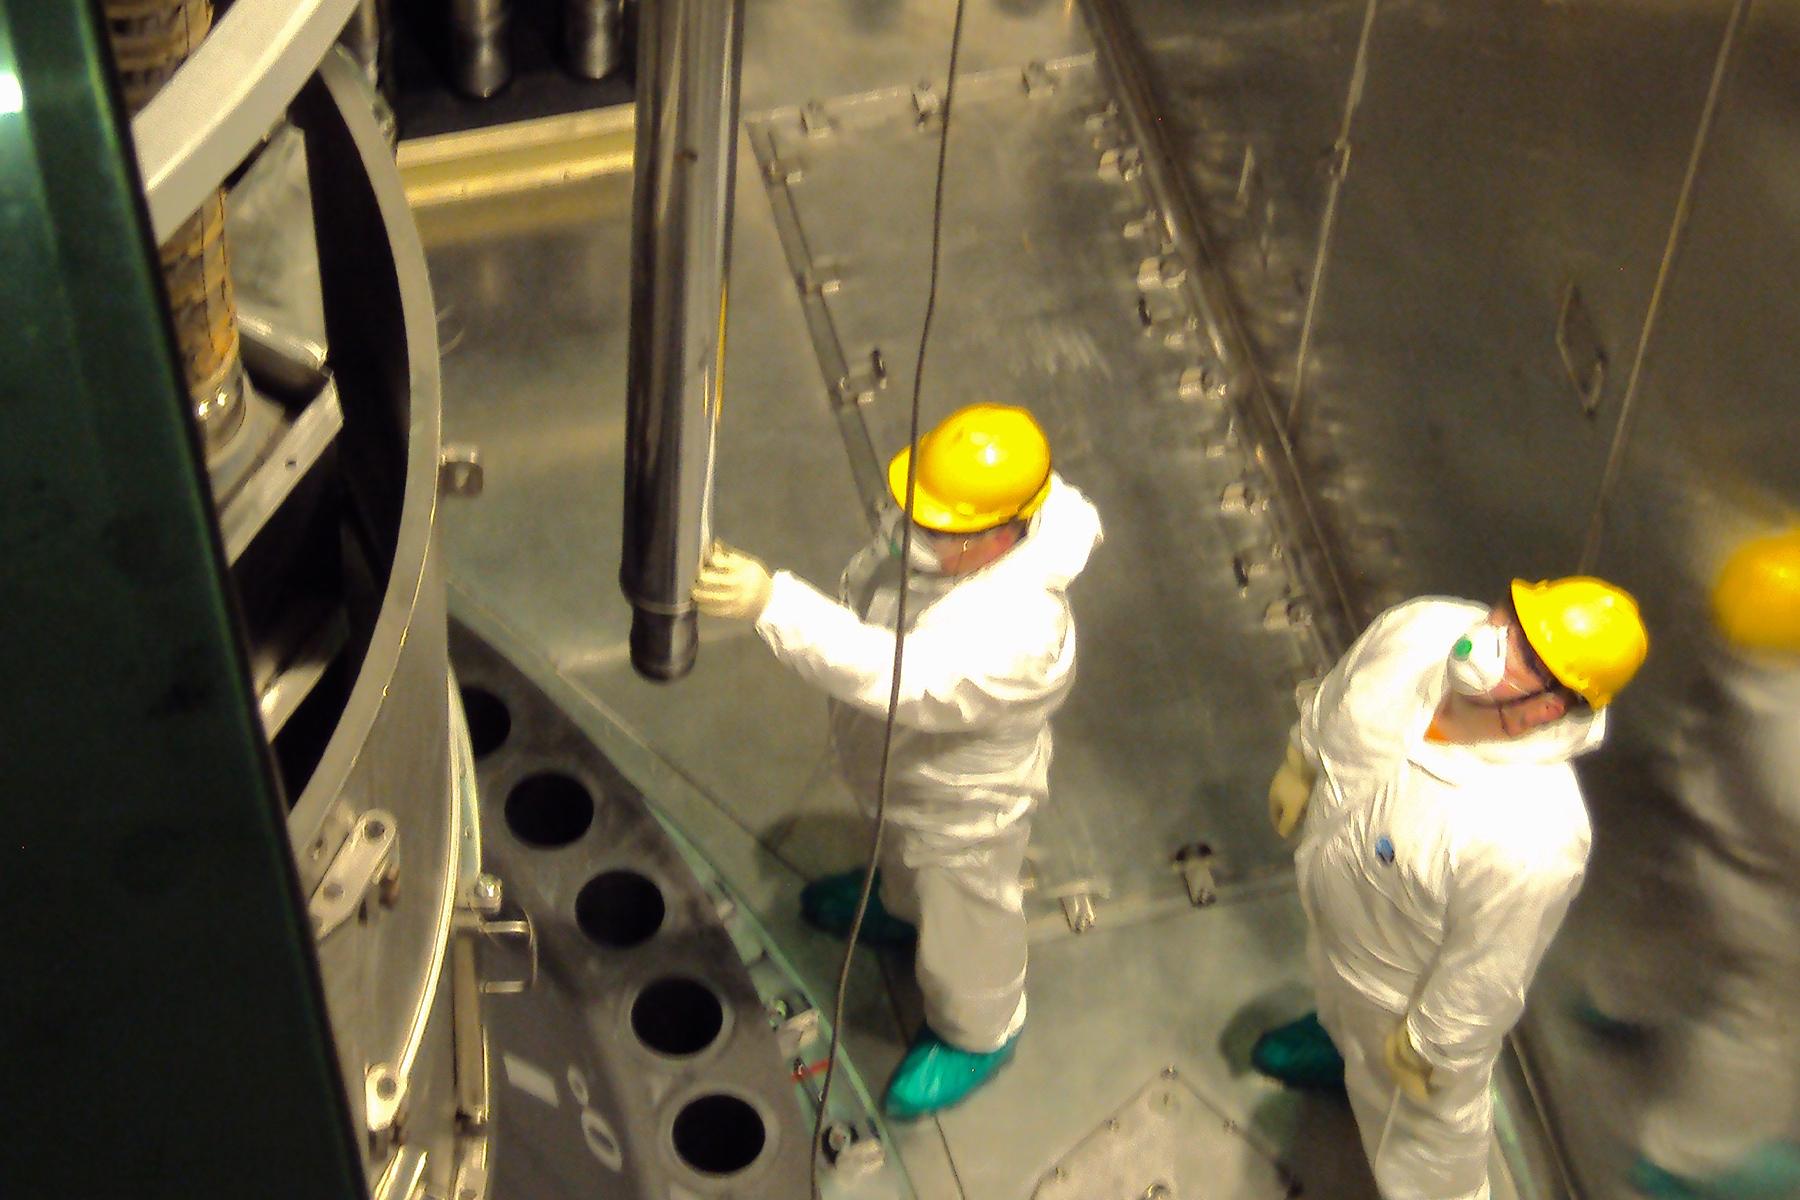 Numip_jedrska_energetika_reaktor.jpg